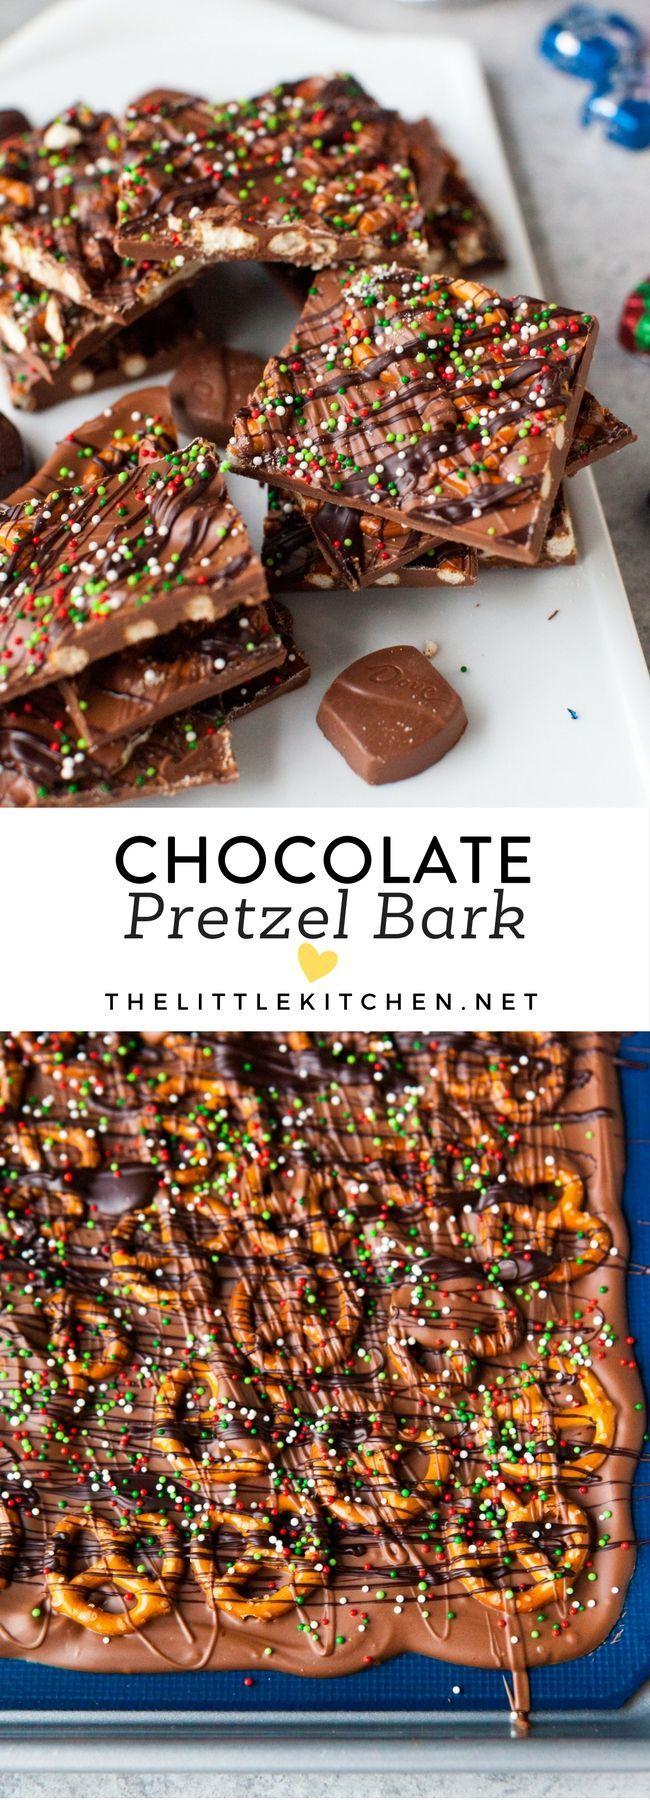 Chocolate Pretzel Bark from thelittlekitchen.net💜💜💜💜💜💜💜💜💜💜💜